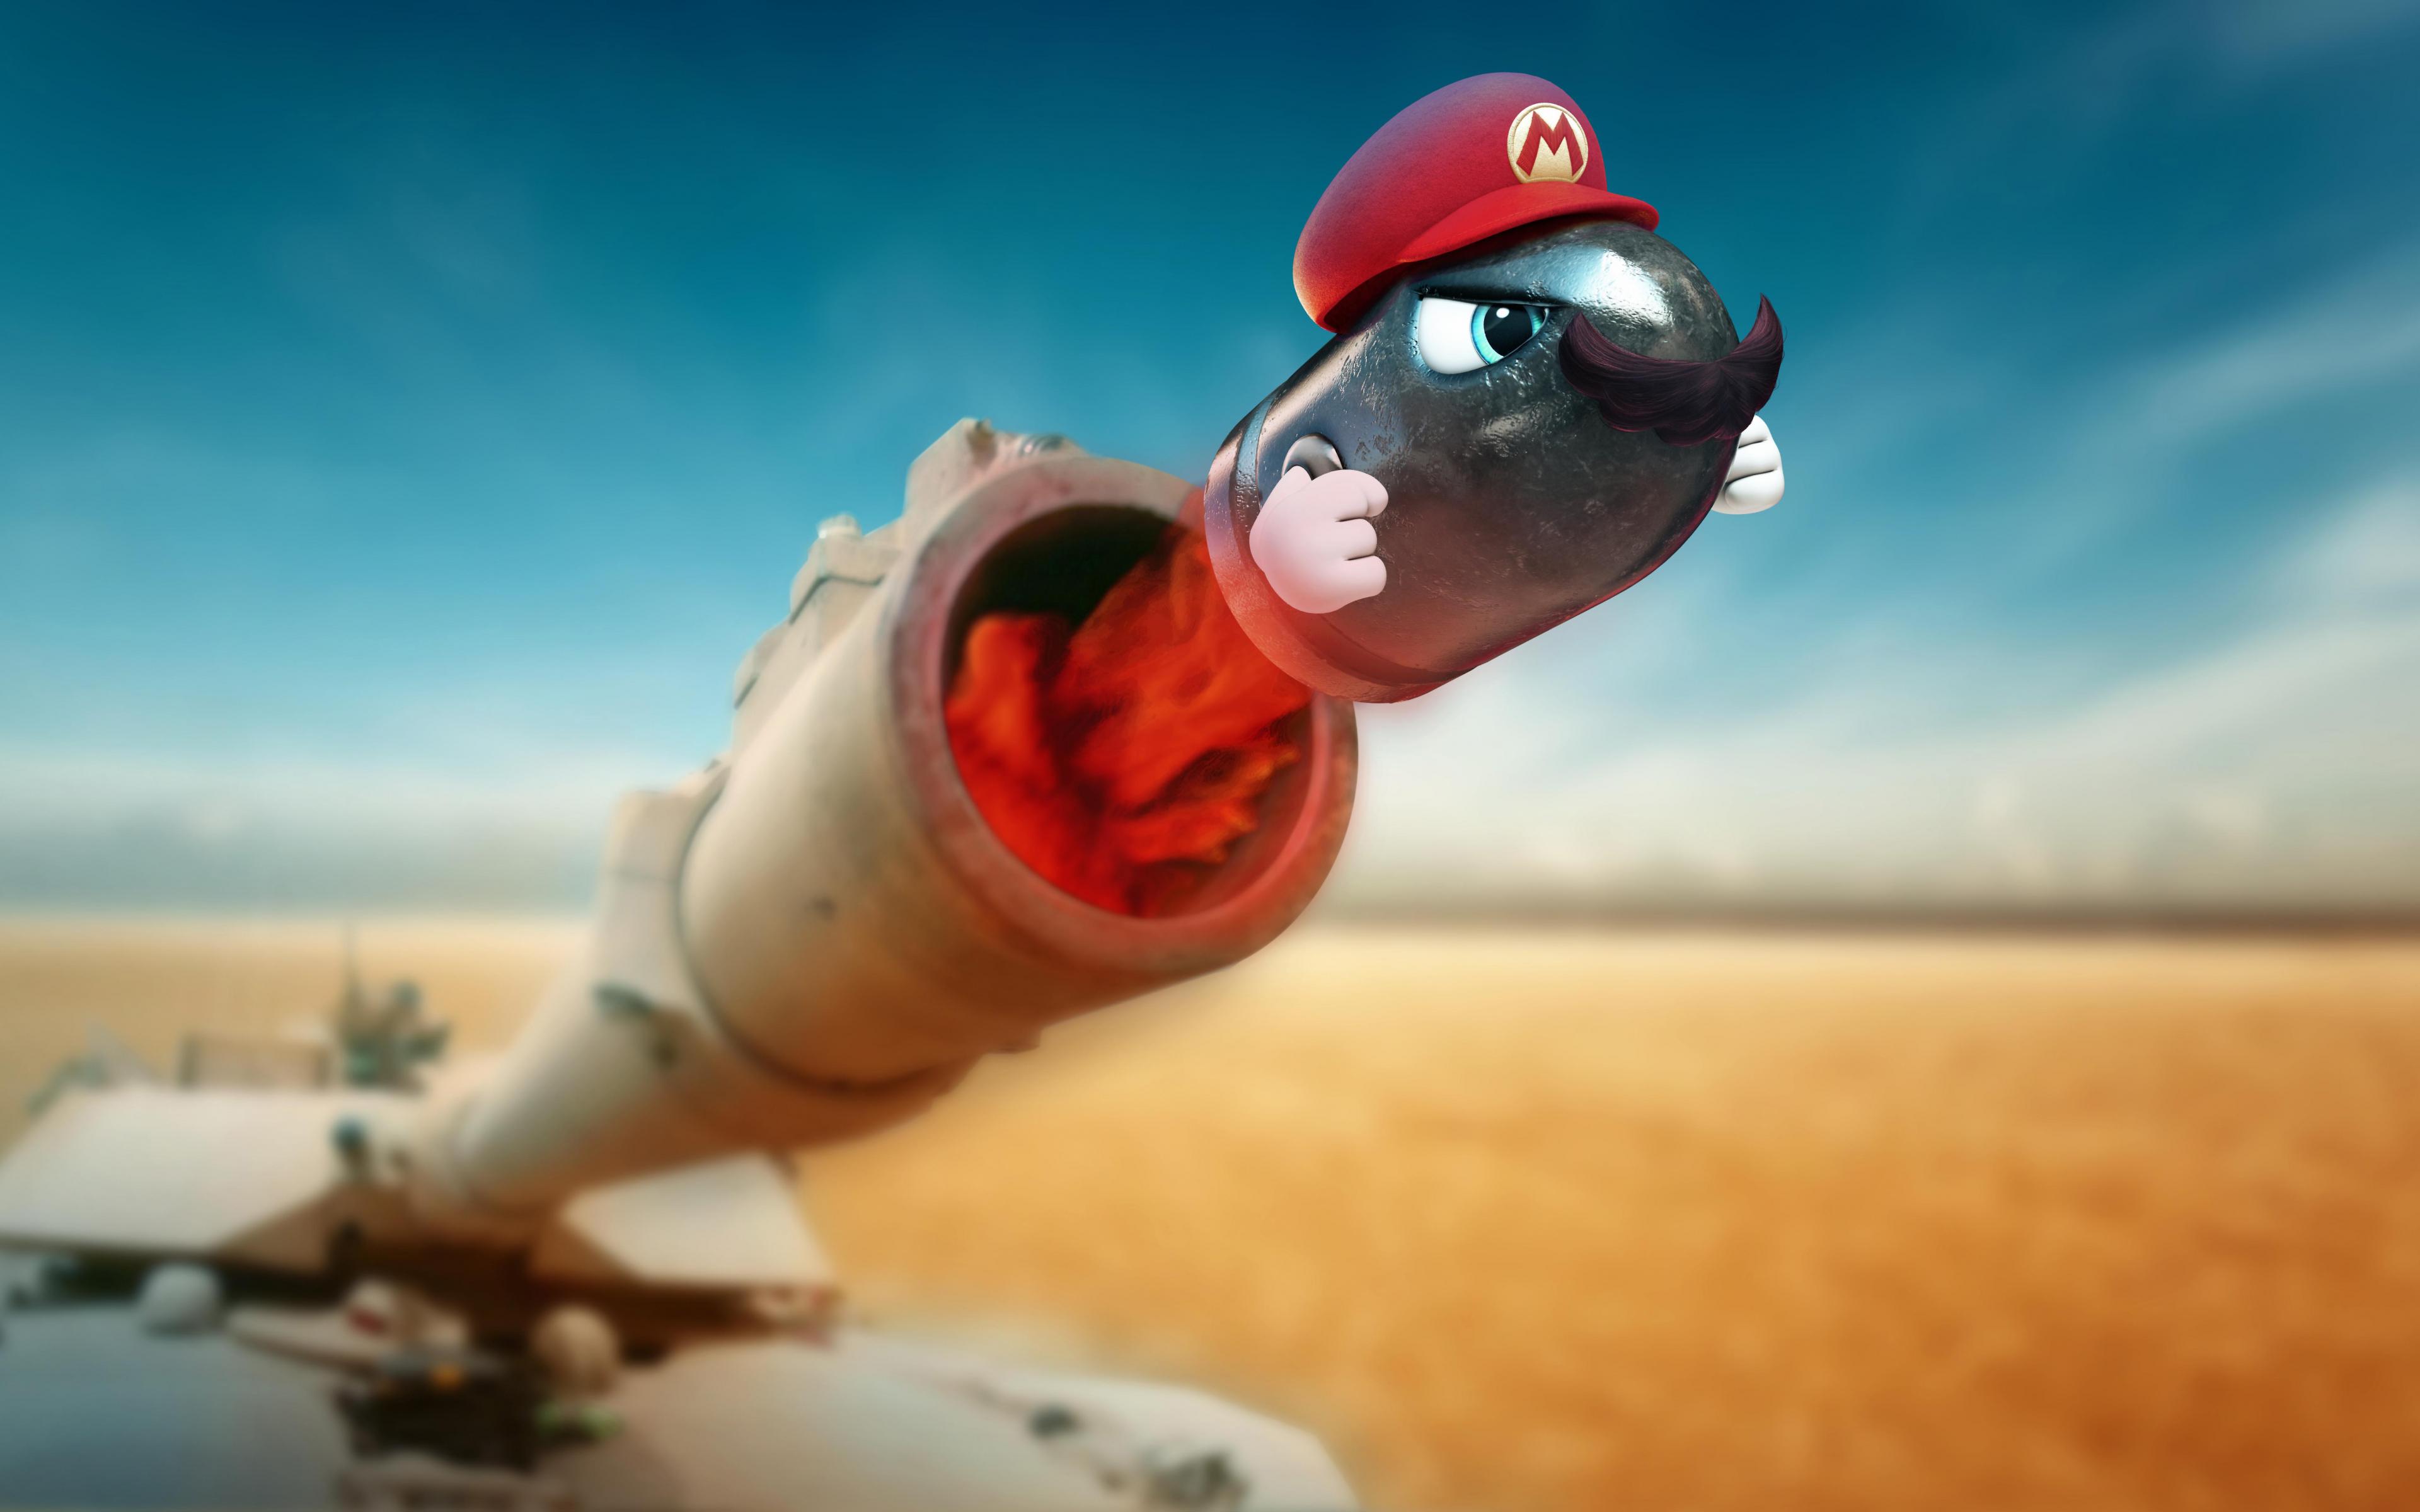 Desktop Wallpaper Super Mario Odyssey 2017 Game Tank Fire Hd Image Picture Background E27514